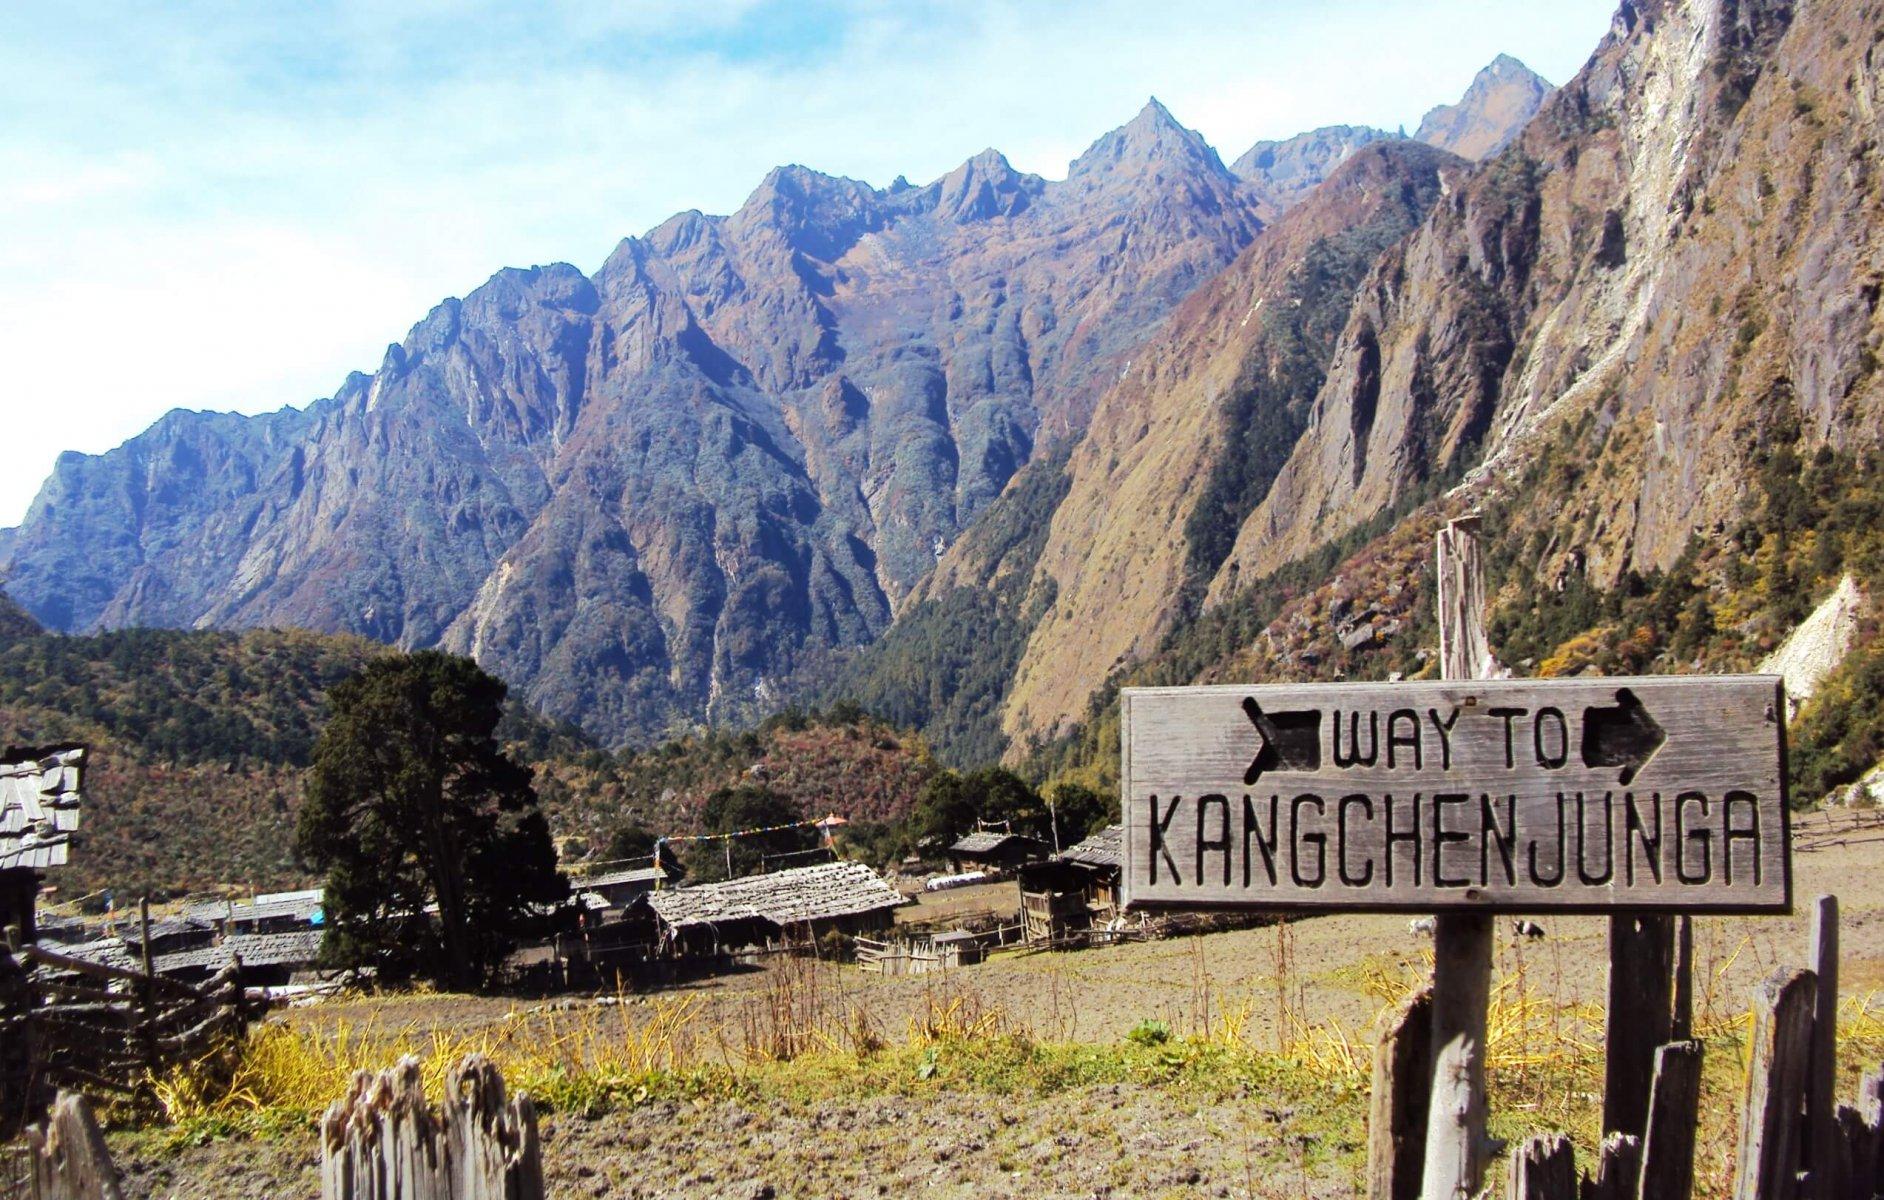 Mai Valley & Kangchenjunga contain medicinal plants found nowhere else © Ujjwal Sherchan